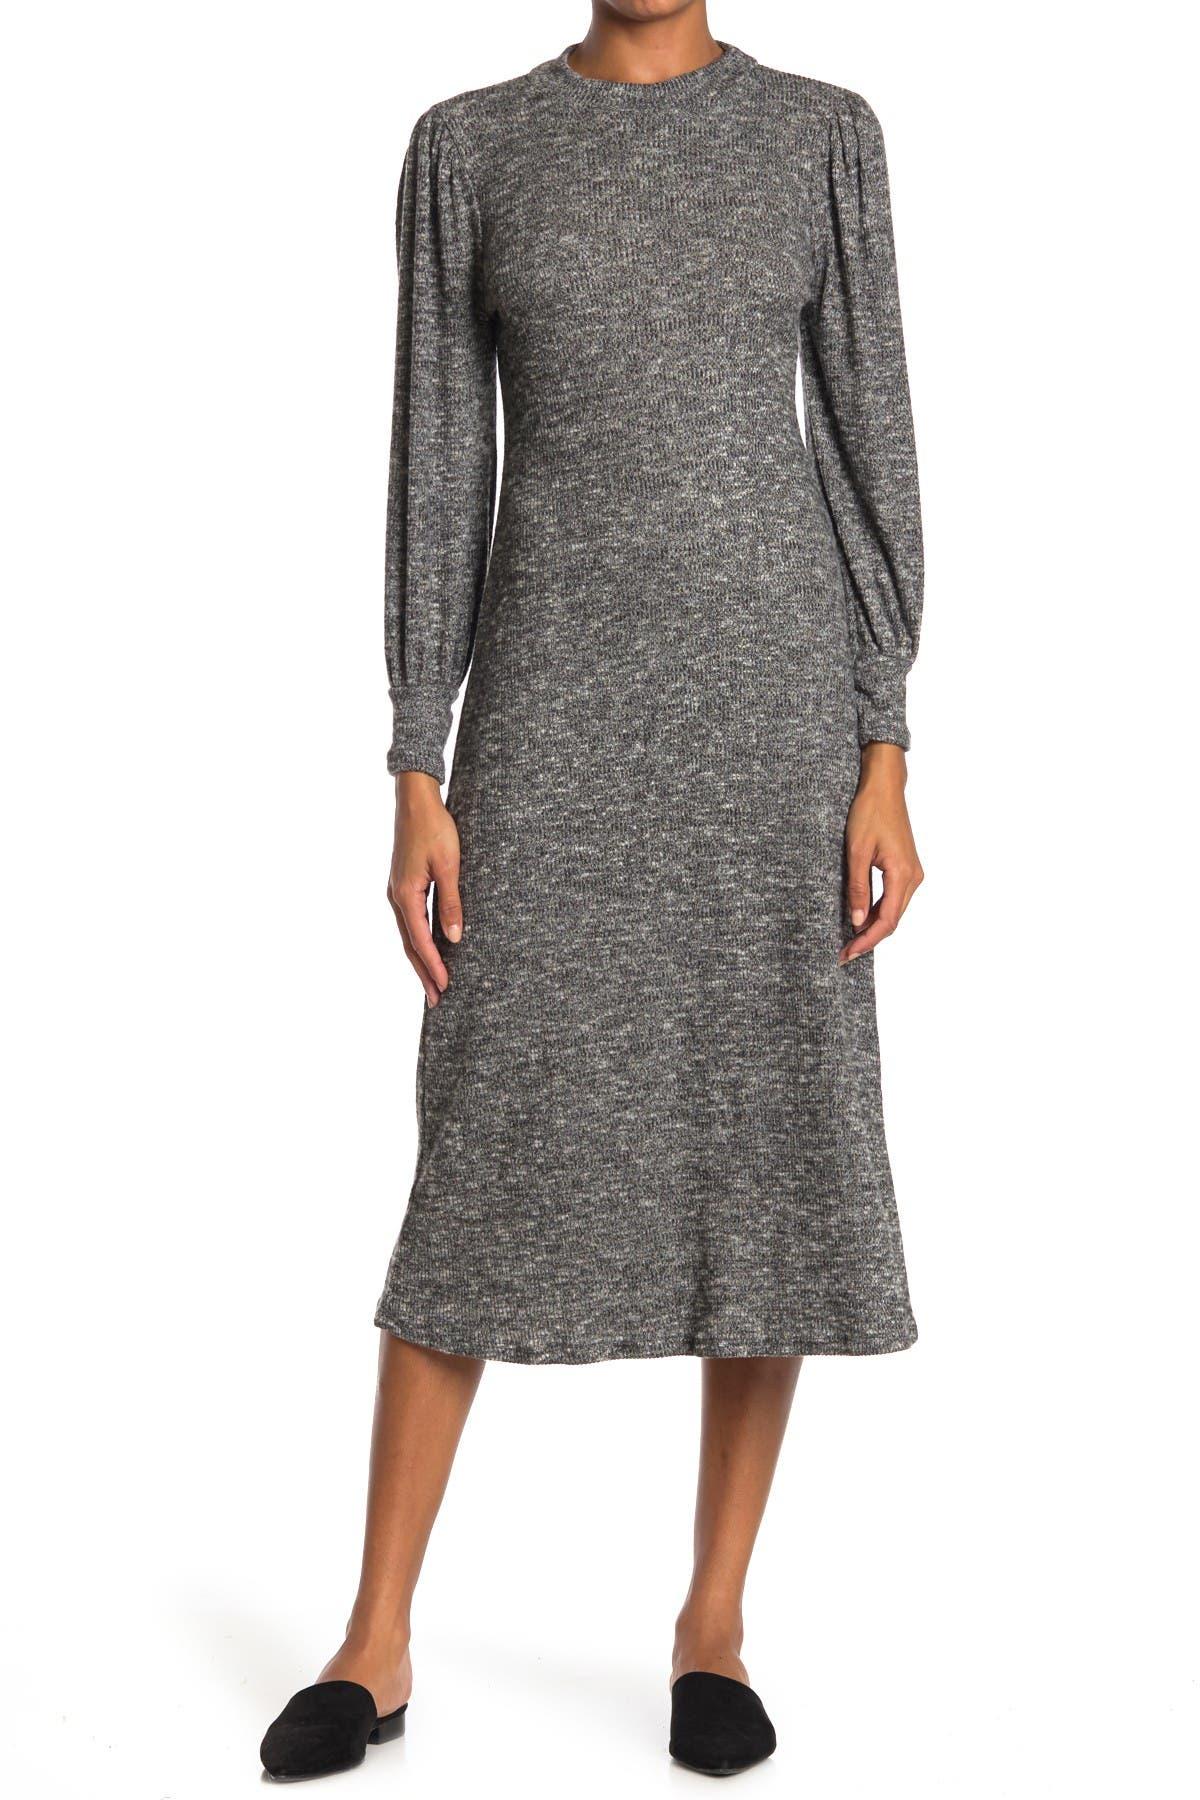 Image of Lush Long Sleeve Sweater Dress